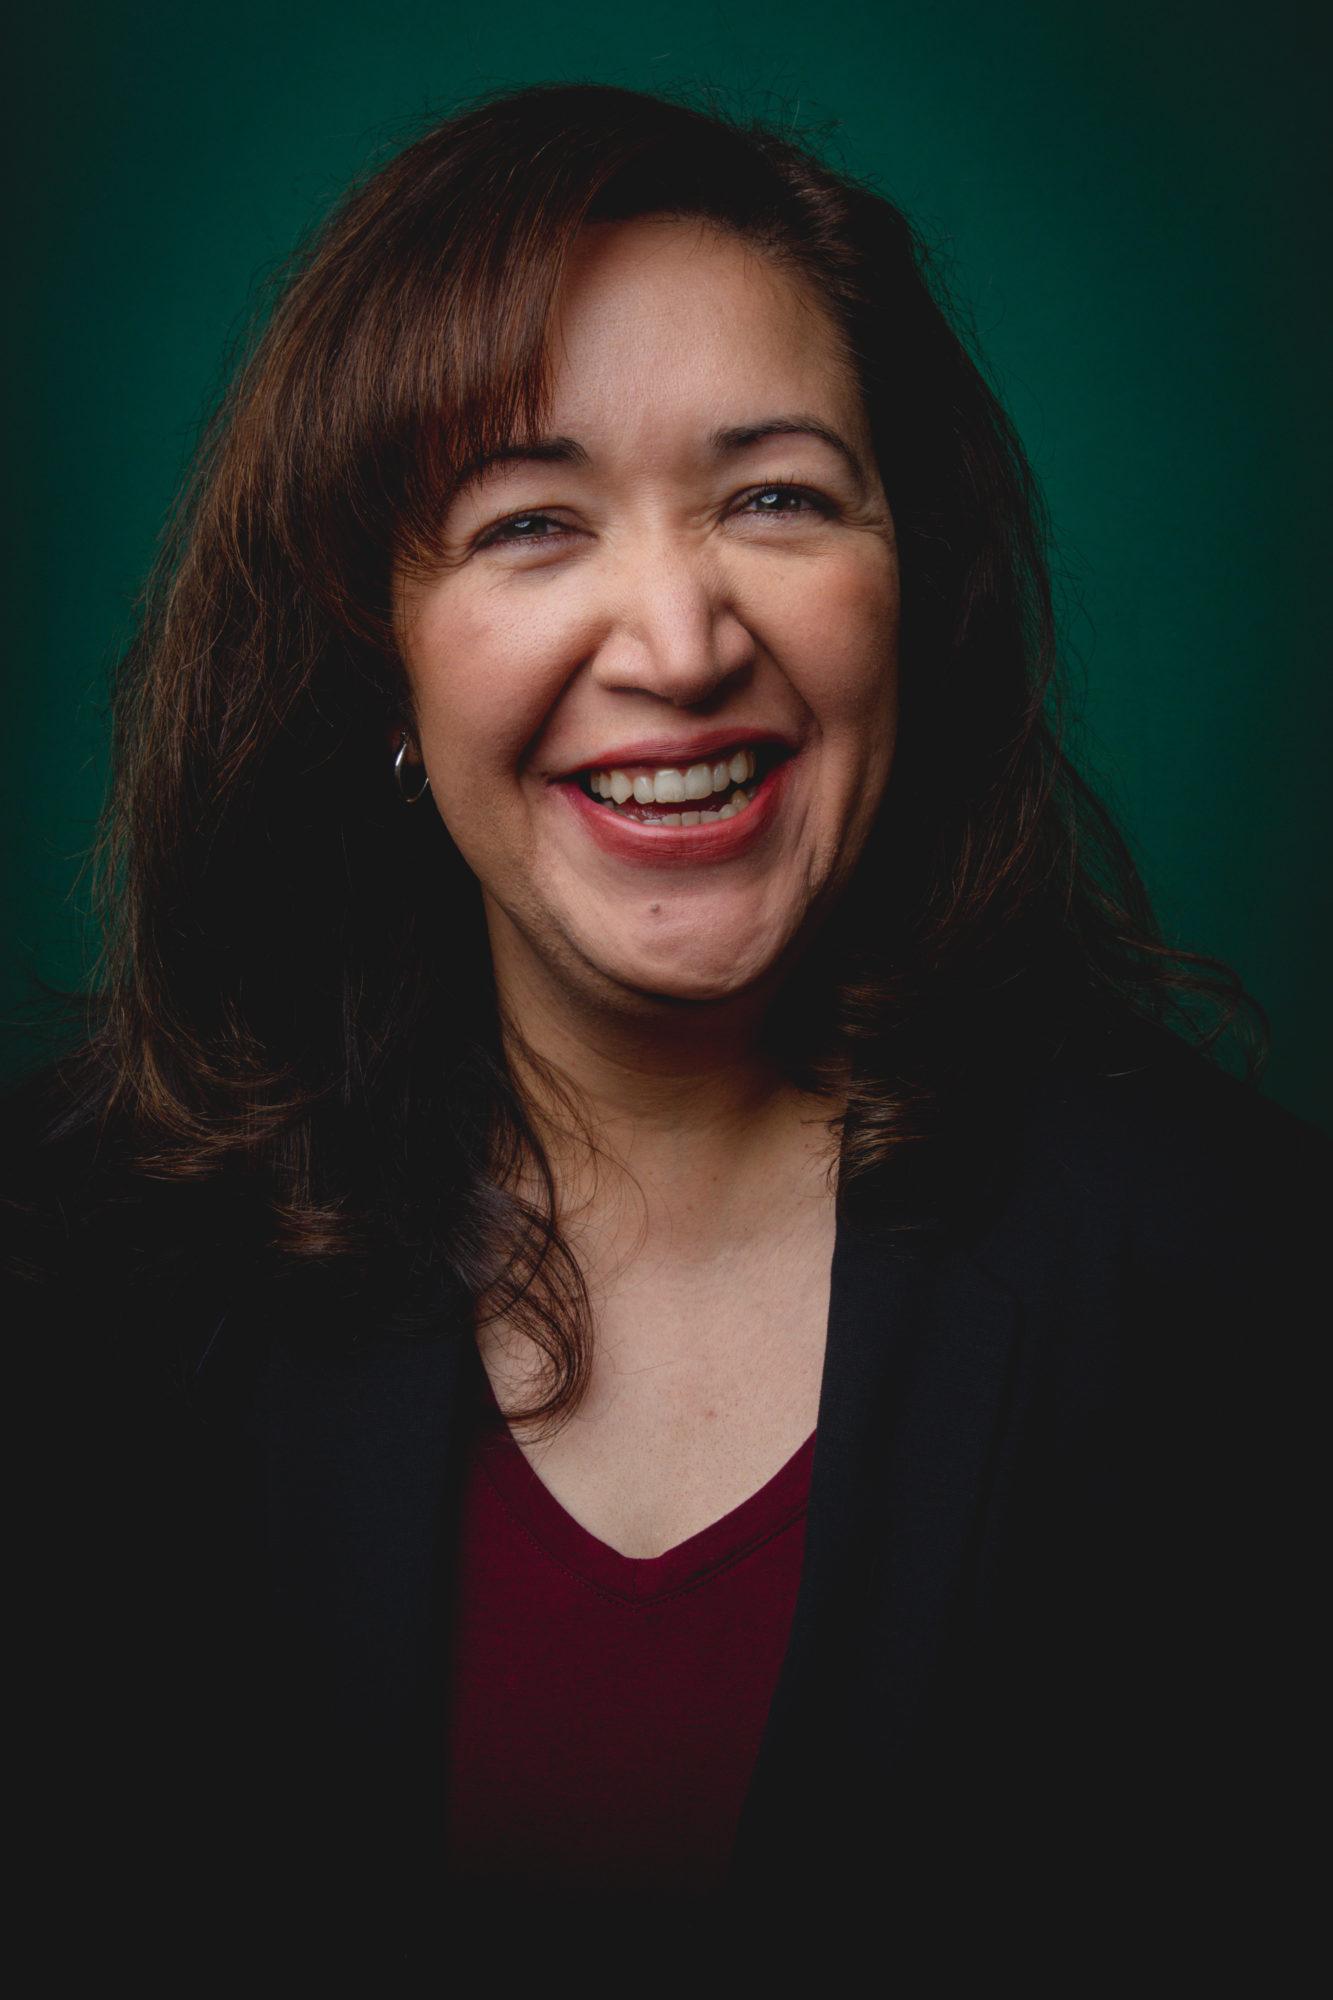 Zeyry Moore | 2021 30 Women to Watch | Utah Business